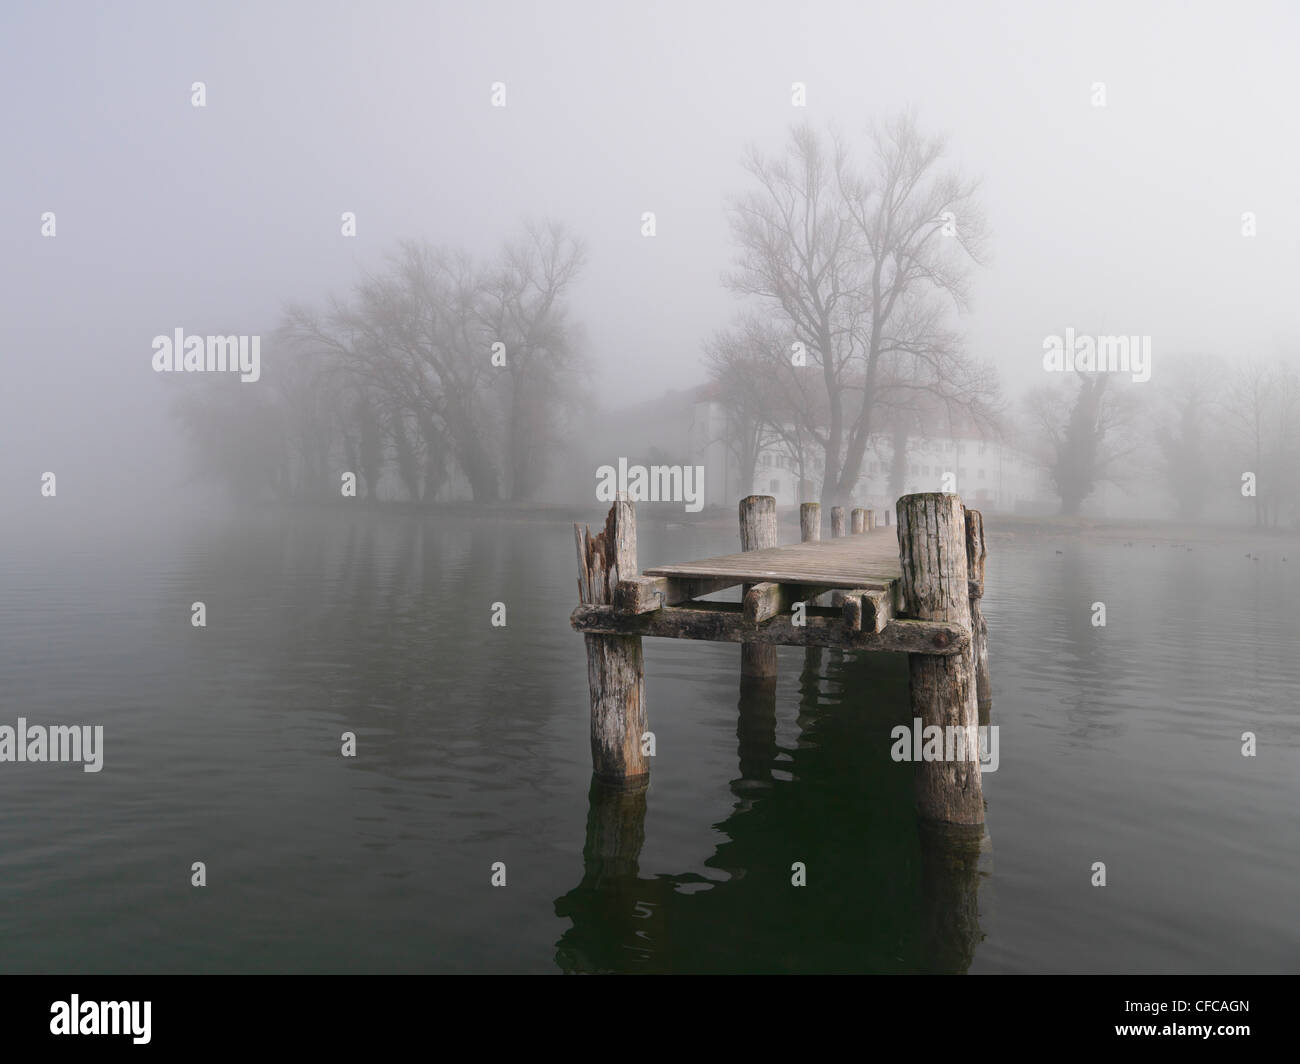 Old pier at Frauenchiemsee, Fraueninsel, Chiemgau, Bavaria, Germany Stock Photo